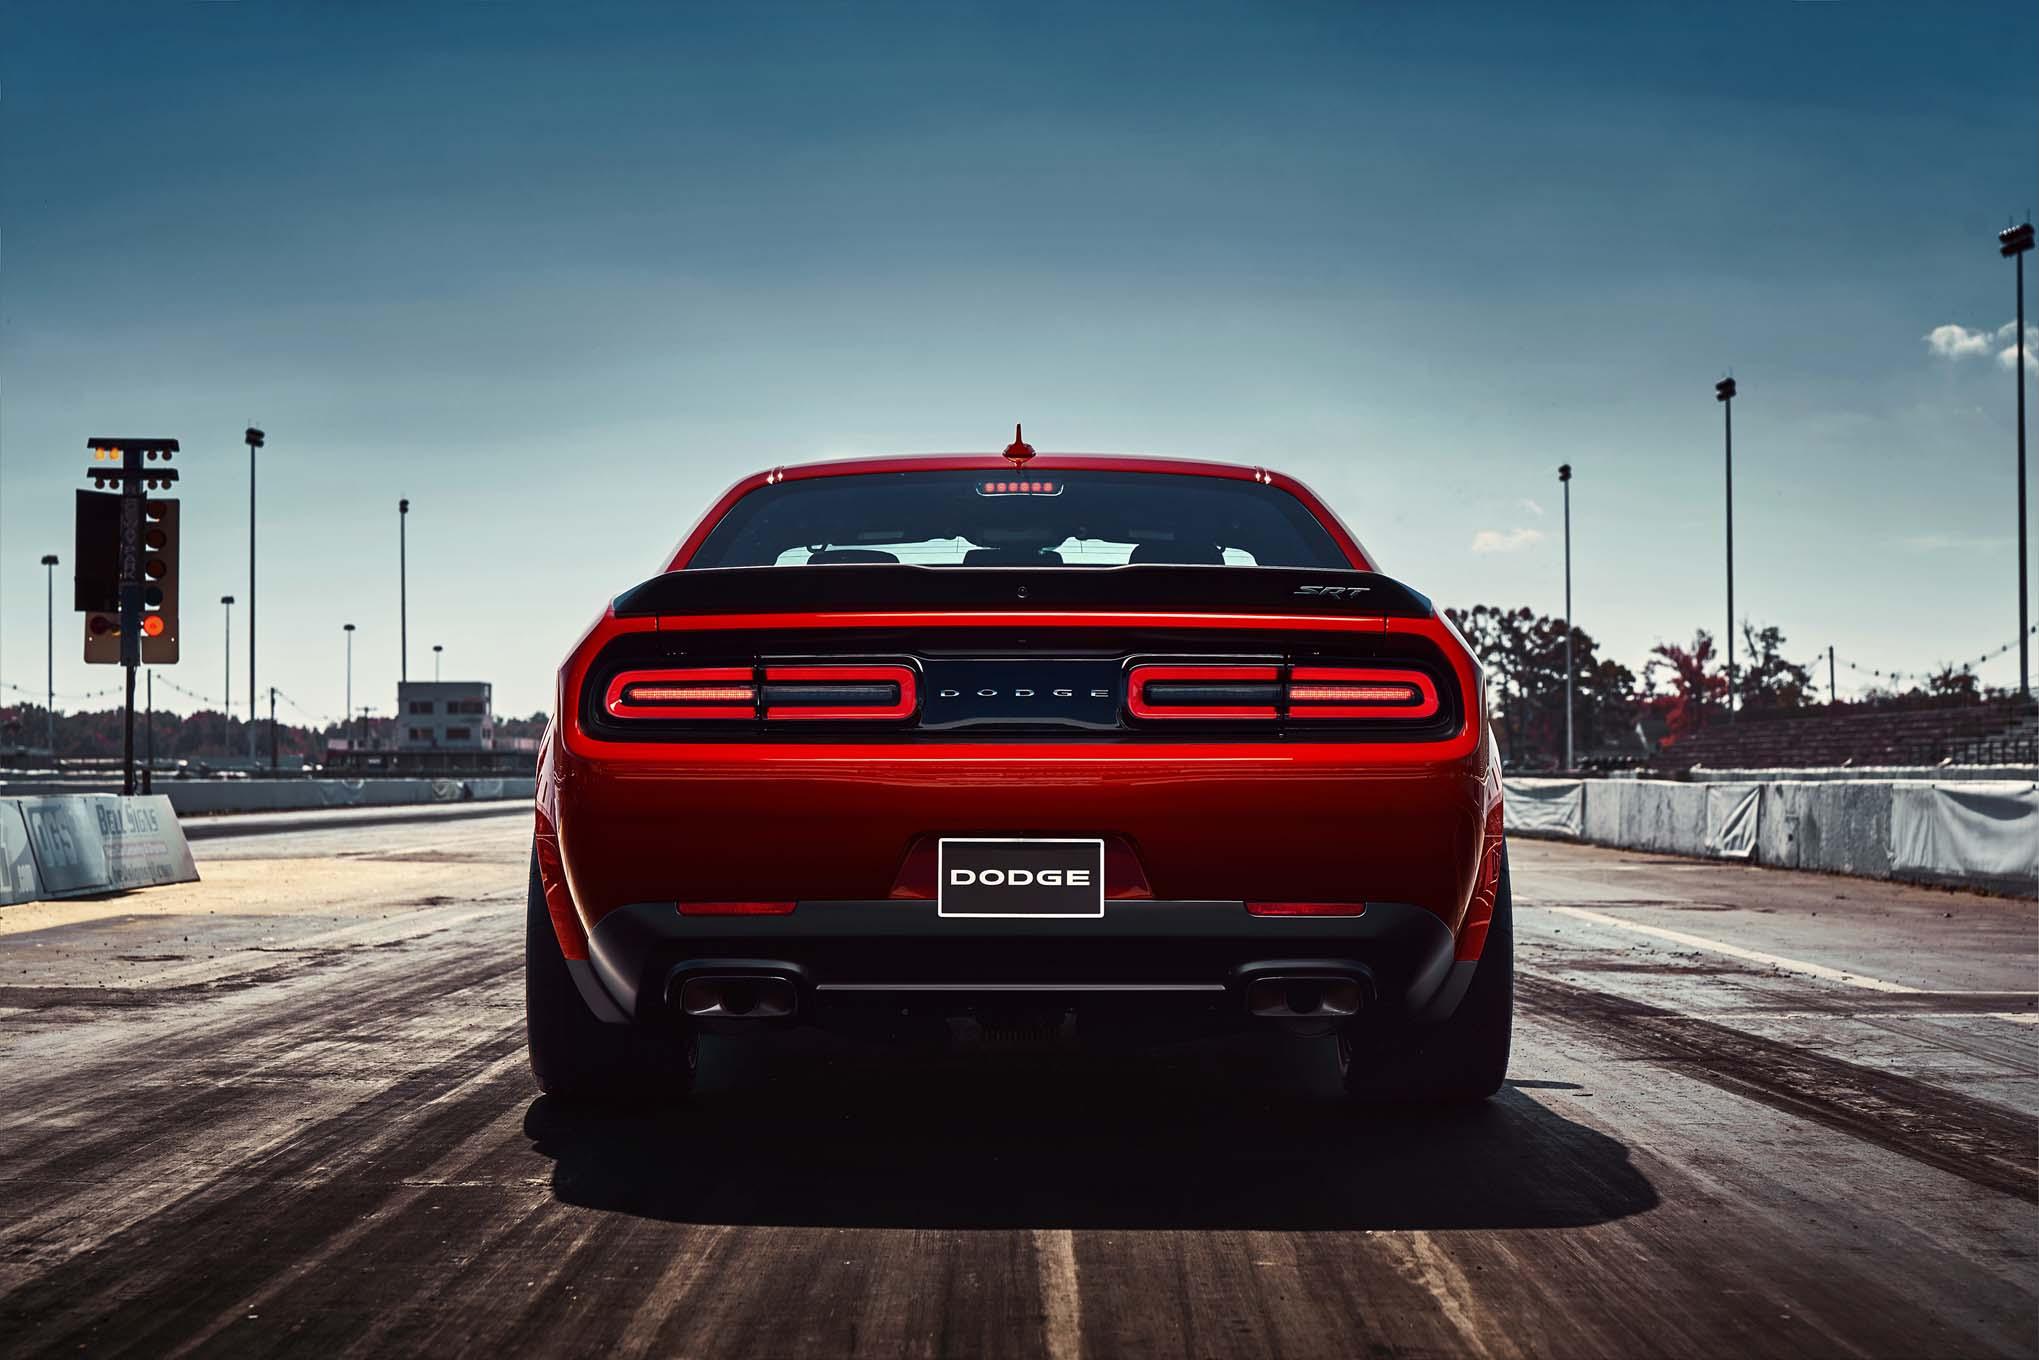 Car Dodge Dodge Challenger Dodge Challenger Srt Dodge Challenger Srt Demon Mopar Muscle Car Vehicle 2039x1360